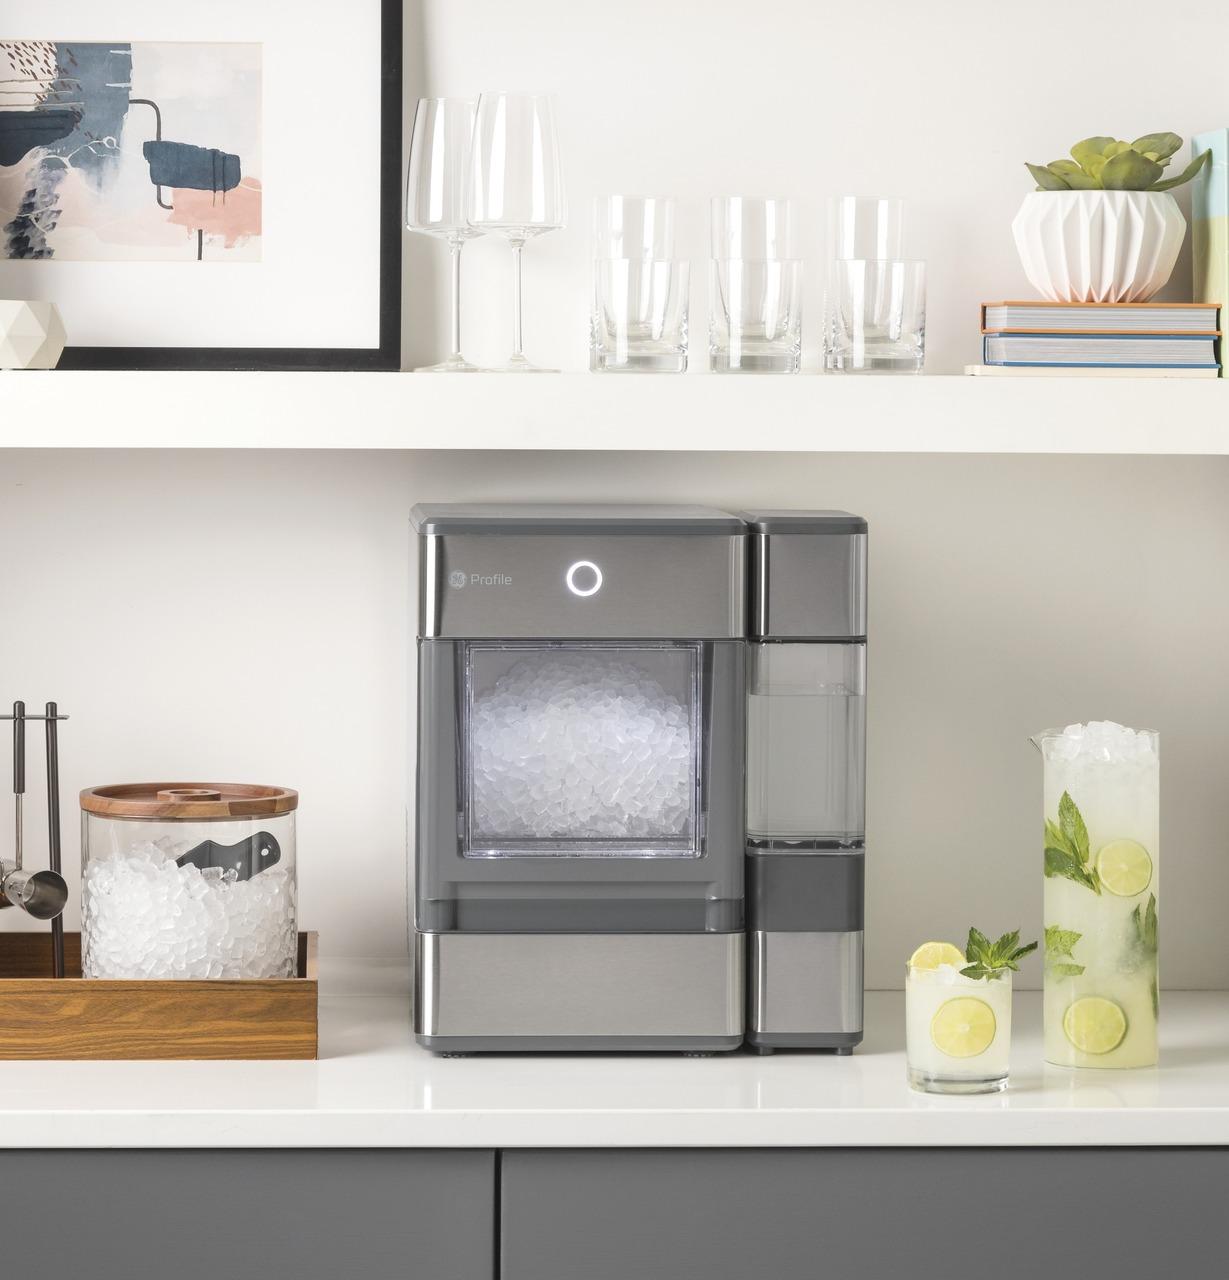 Design of GE Profile Opal Ice Maker